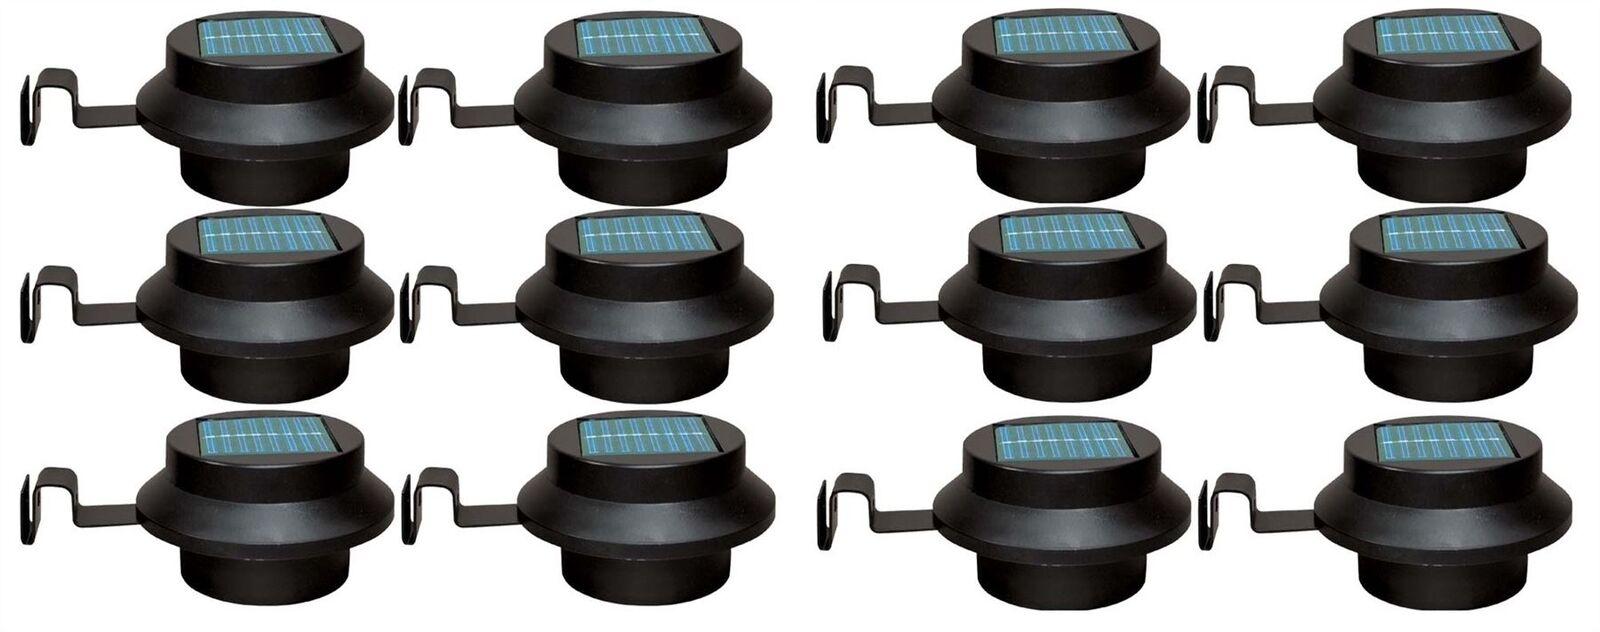 New 12pc schwarz LED Gutter Light Solar Power Outdoor Waterproof Security Flood